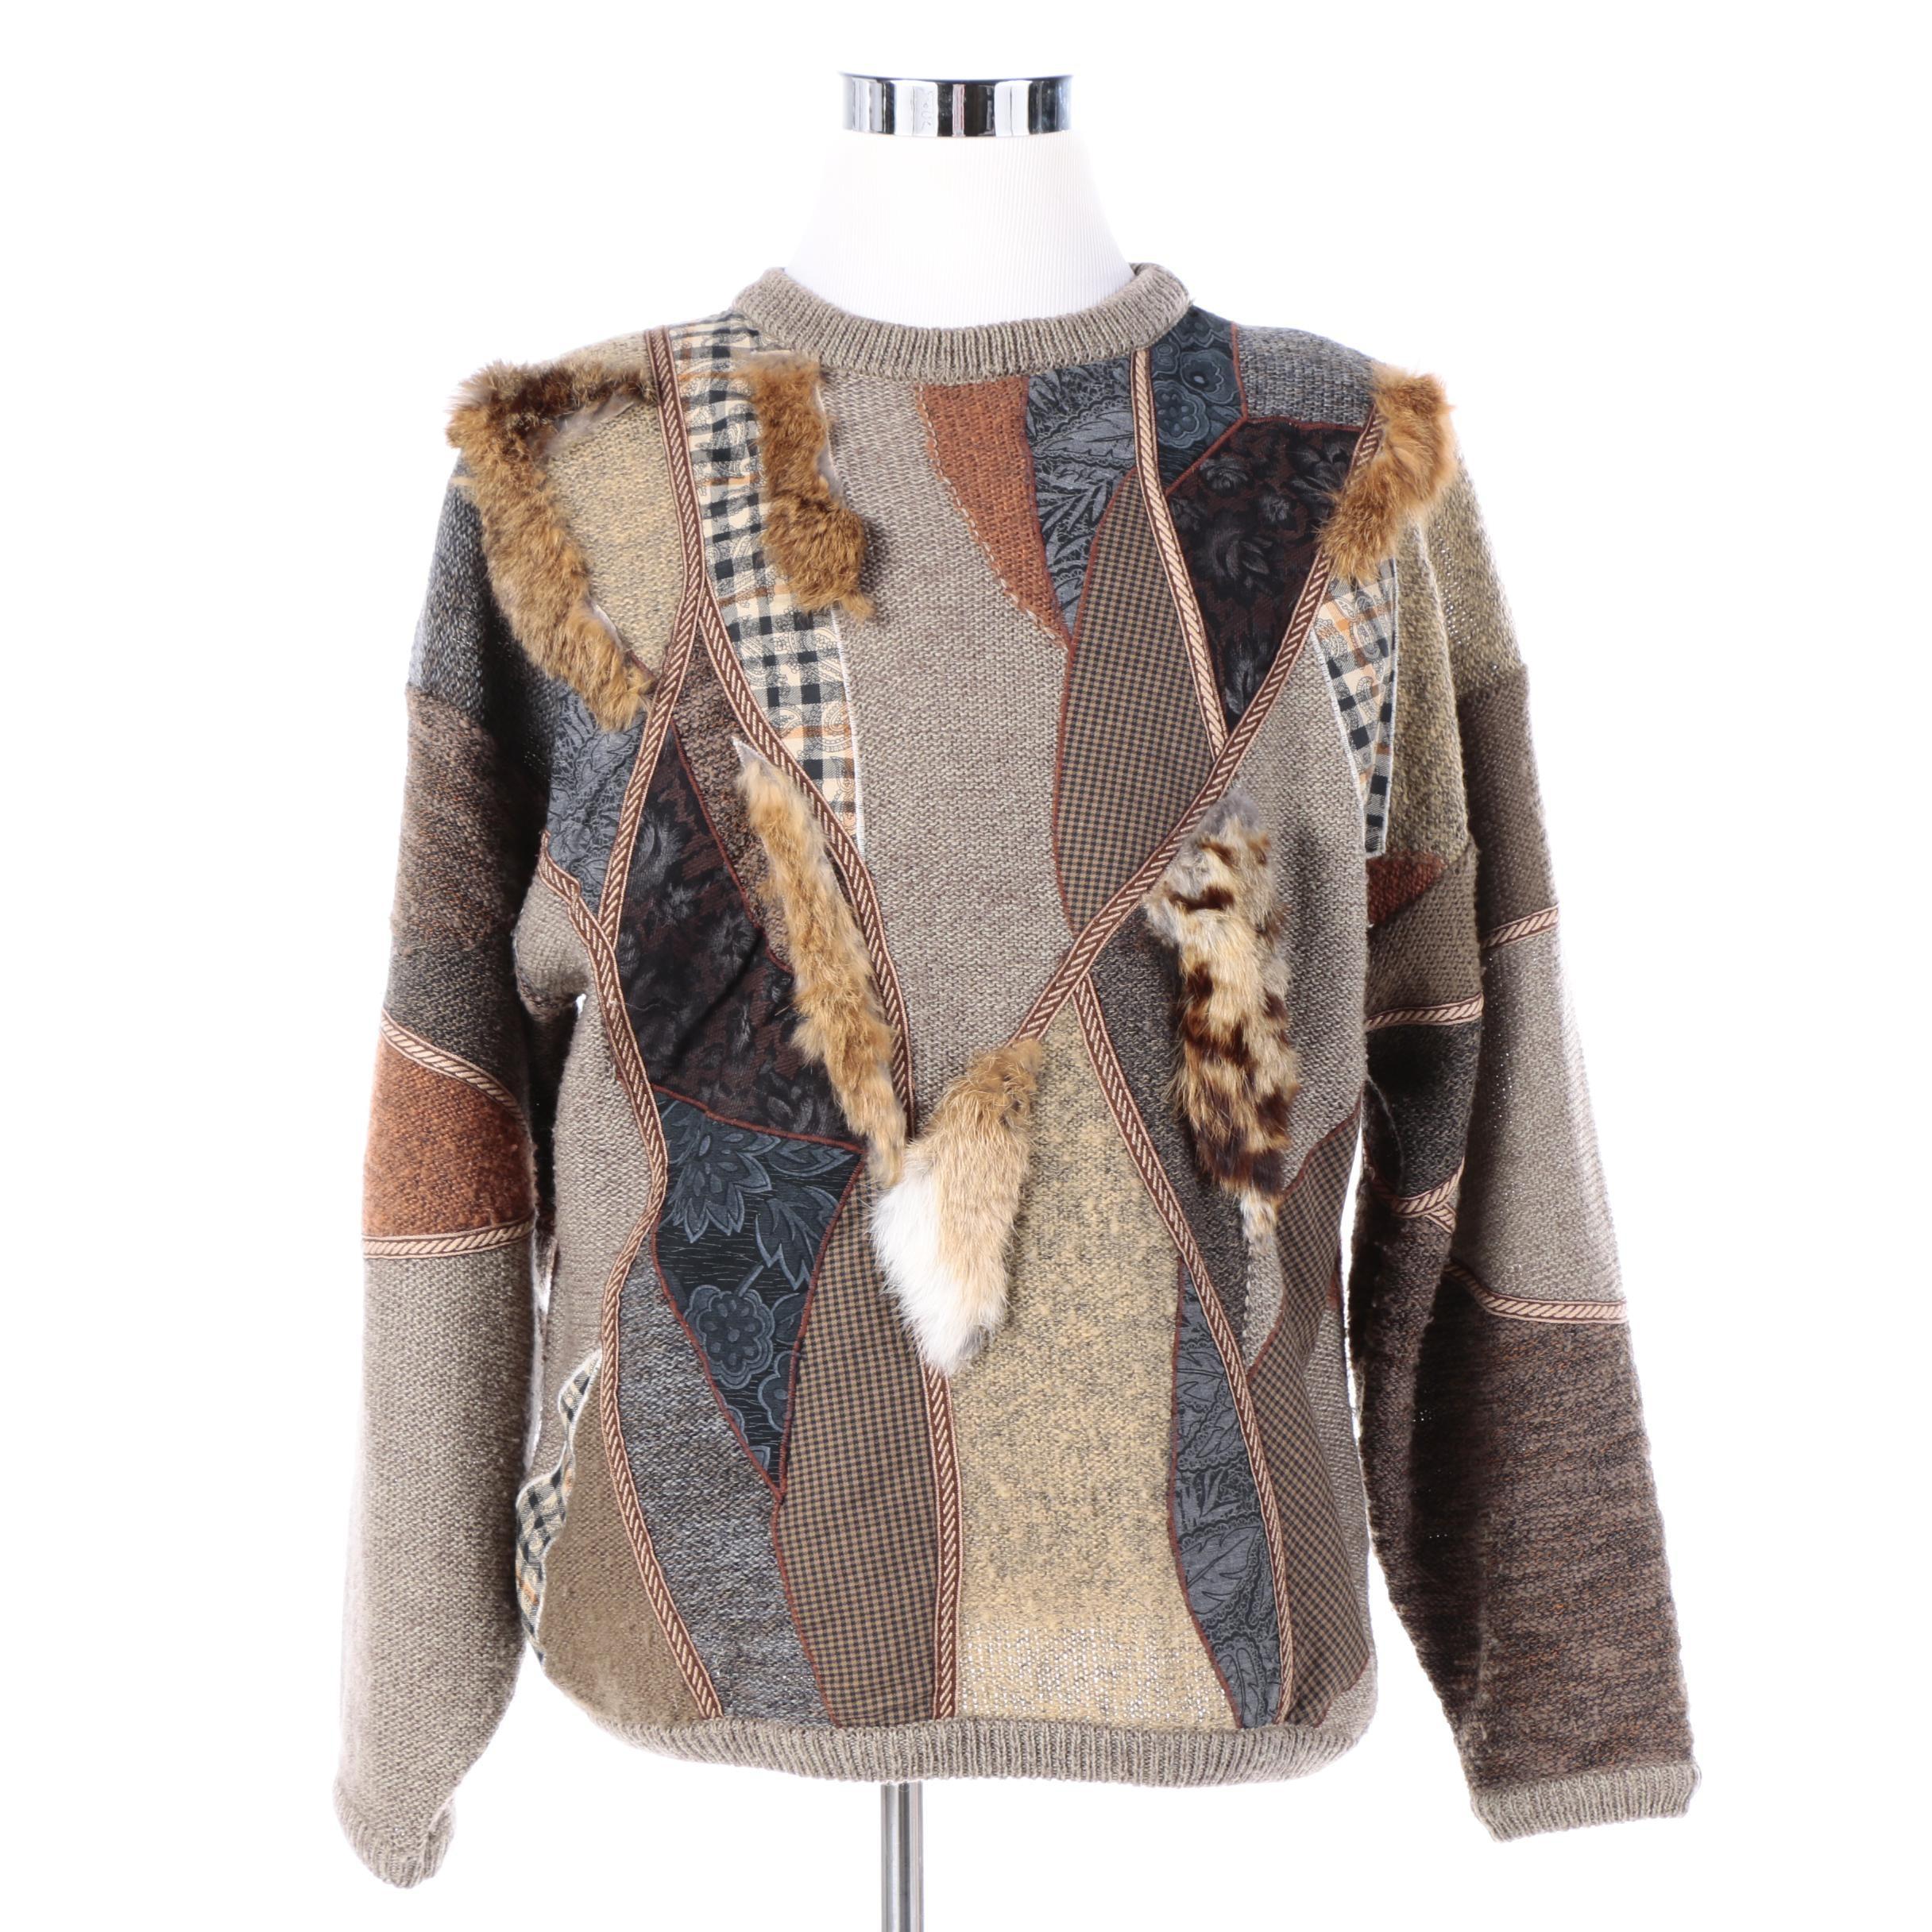 Mariea Kim Sweater with Rabbit Fur Accents